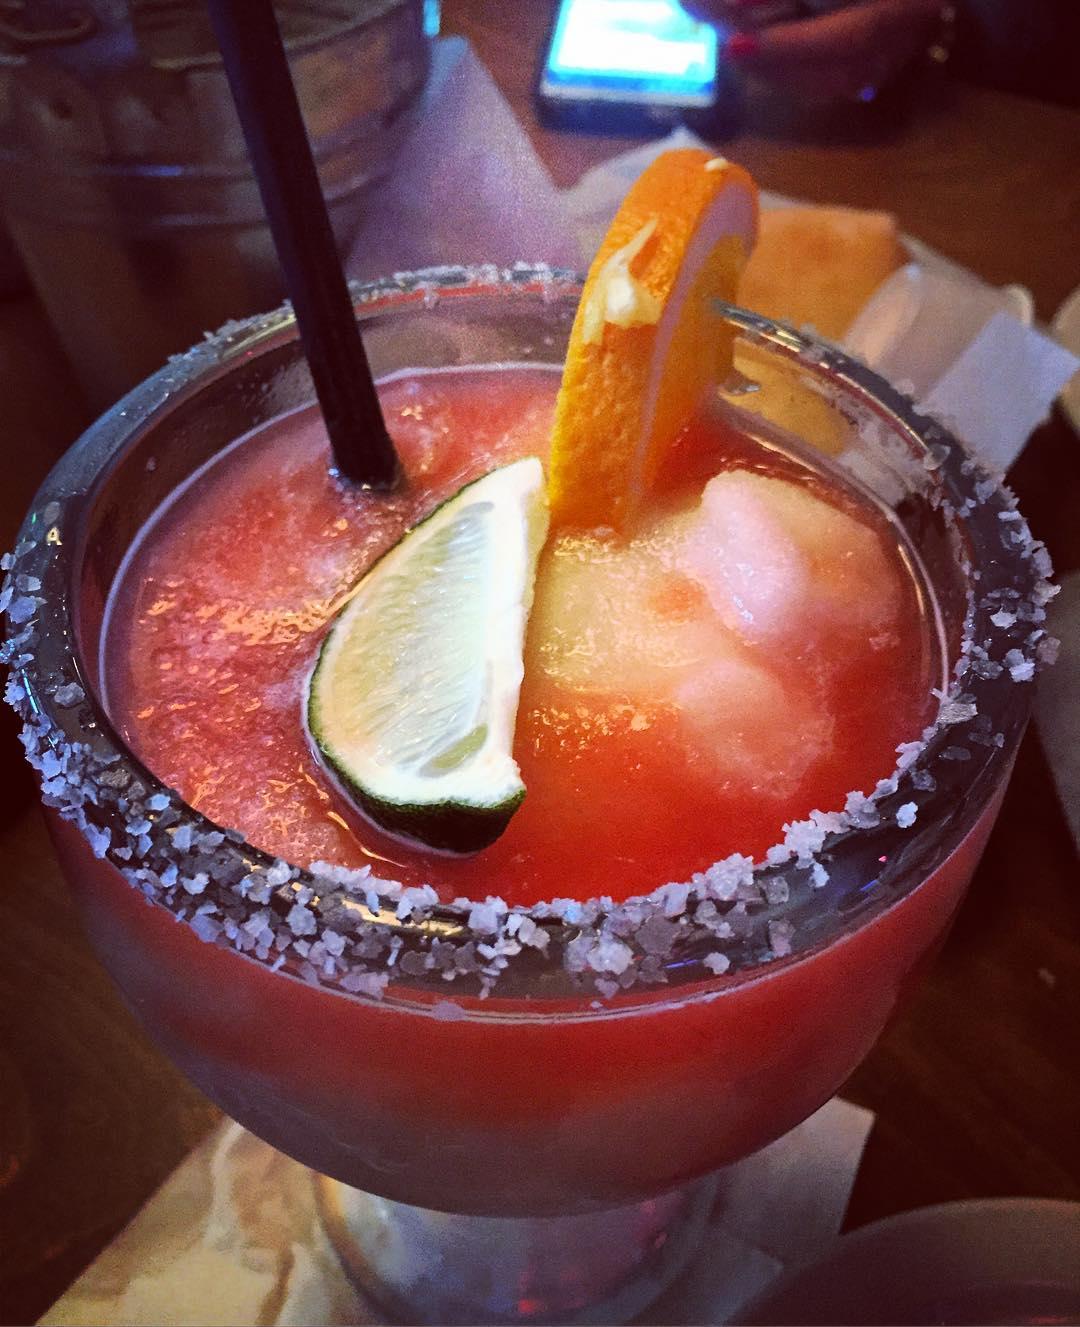 Gatlinburg Restaurants - Texas RoadhouseGatlinburg - Original Photo